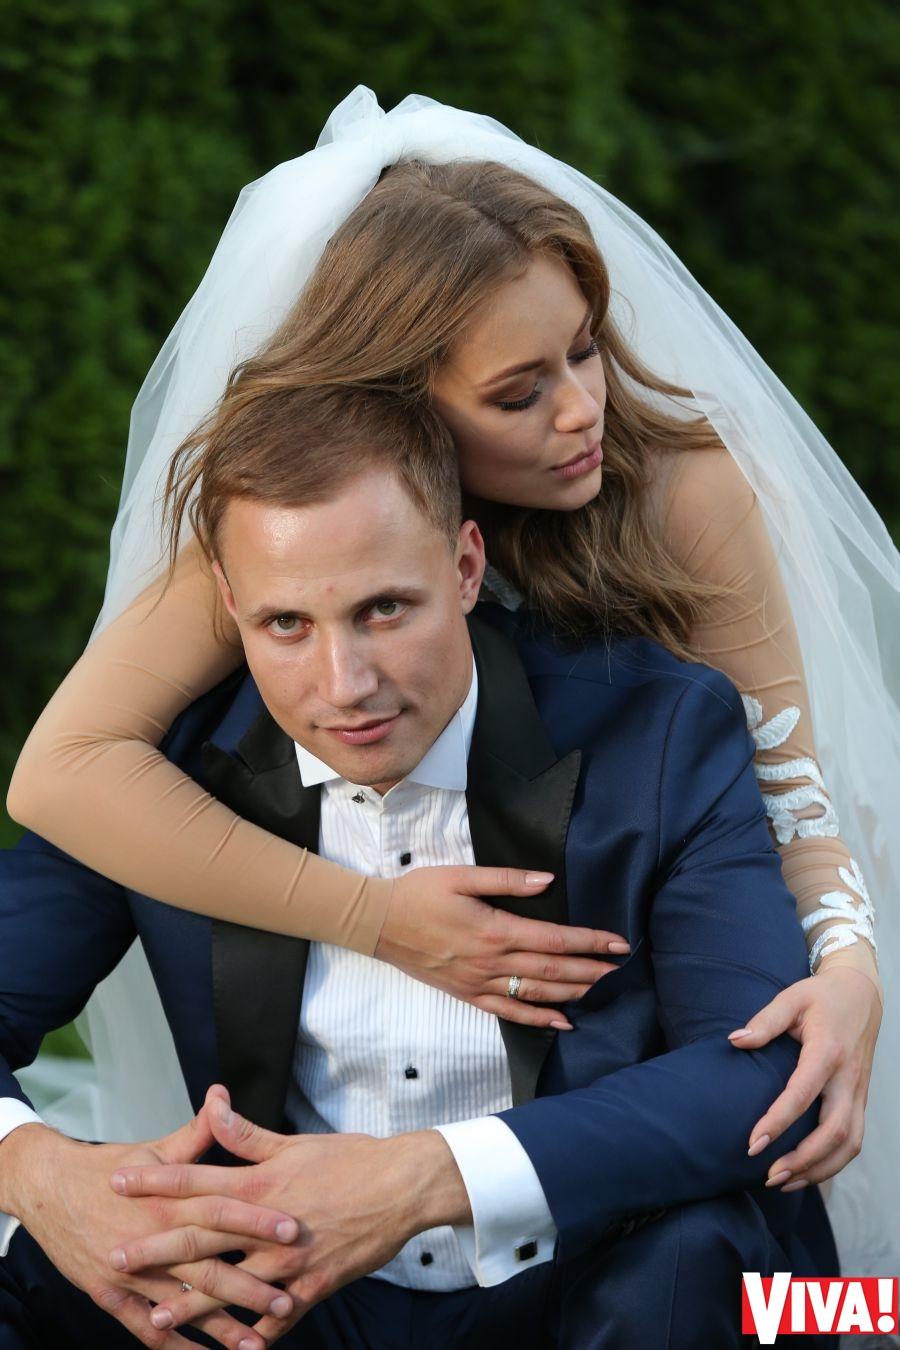 Яна Соломко вышла замуж: ФОТО со свадьбы